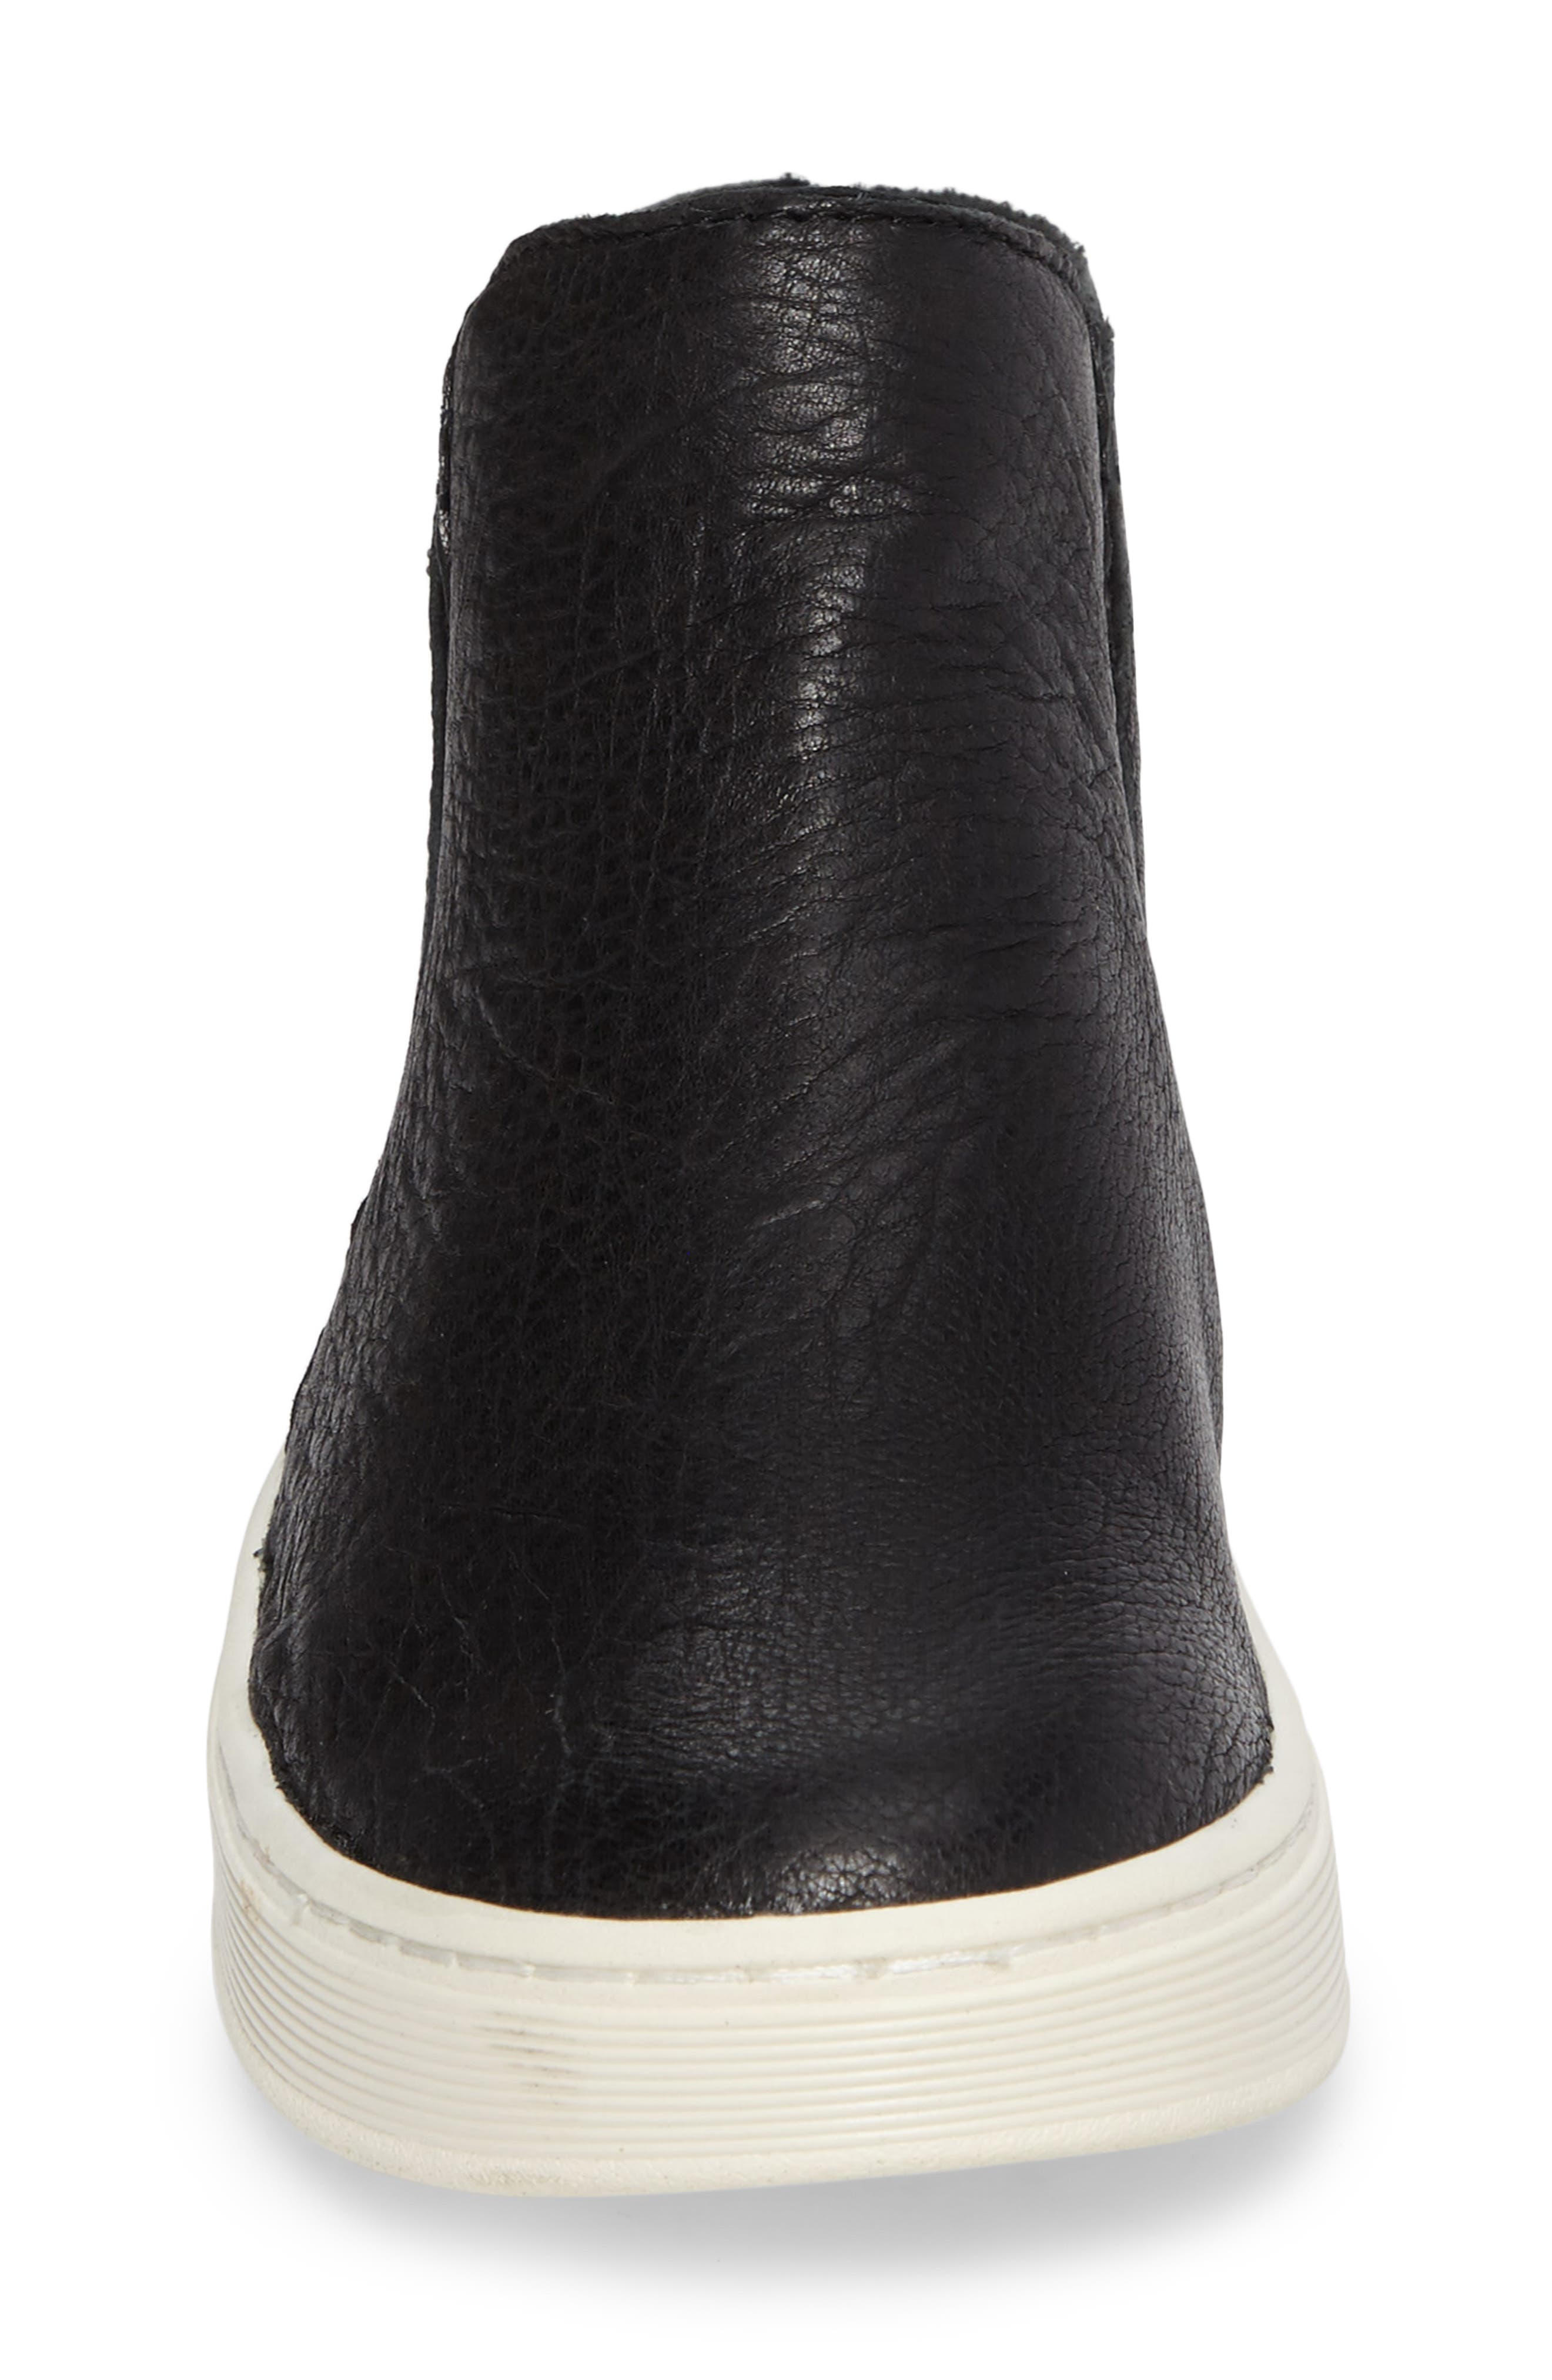 Britton Chelsea Sneaker,                             Alternate thumbnail 4, color,                             BLACK LEATHER